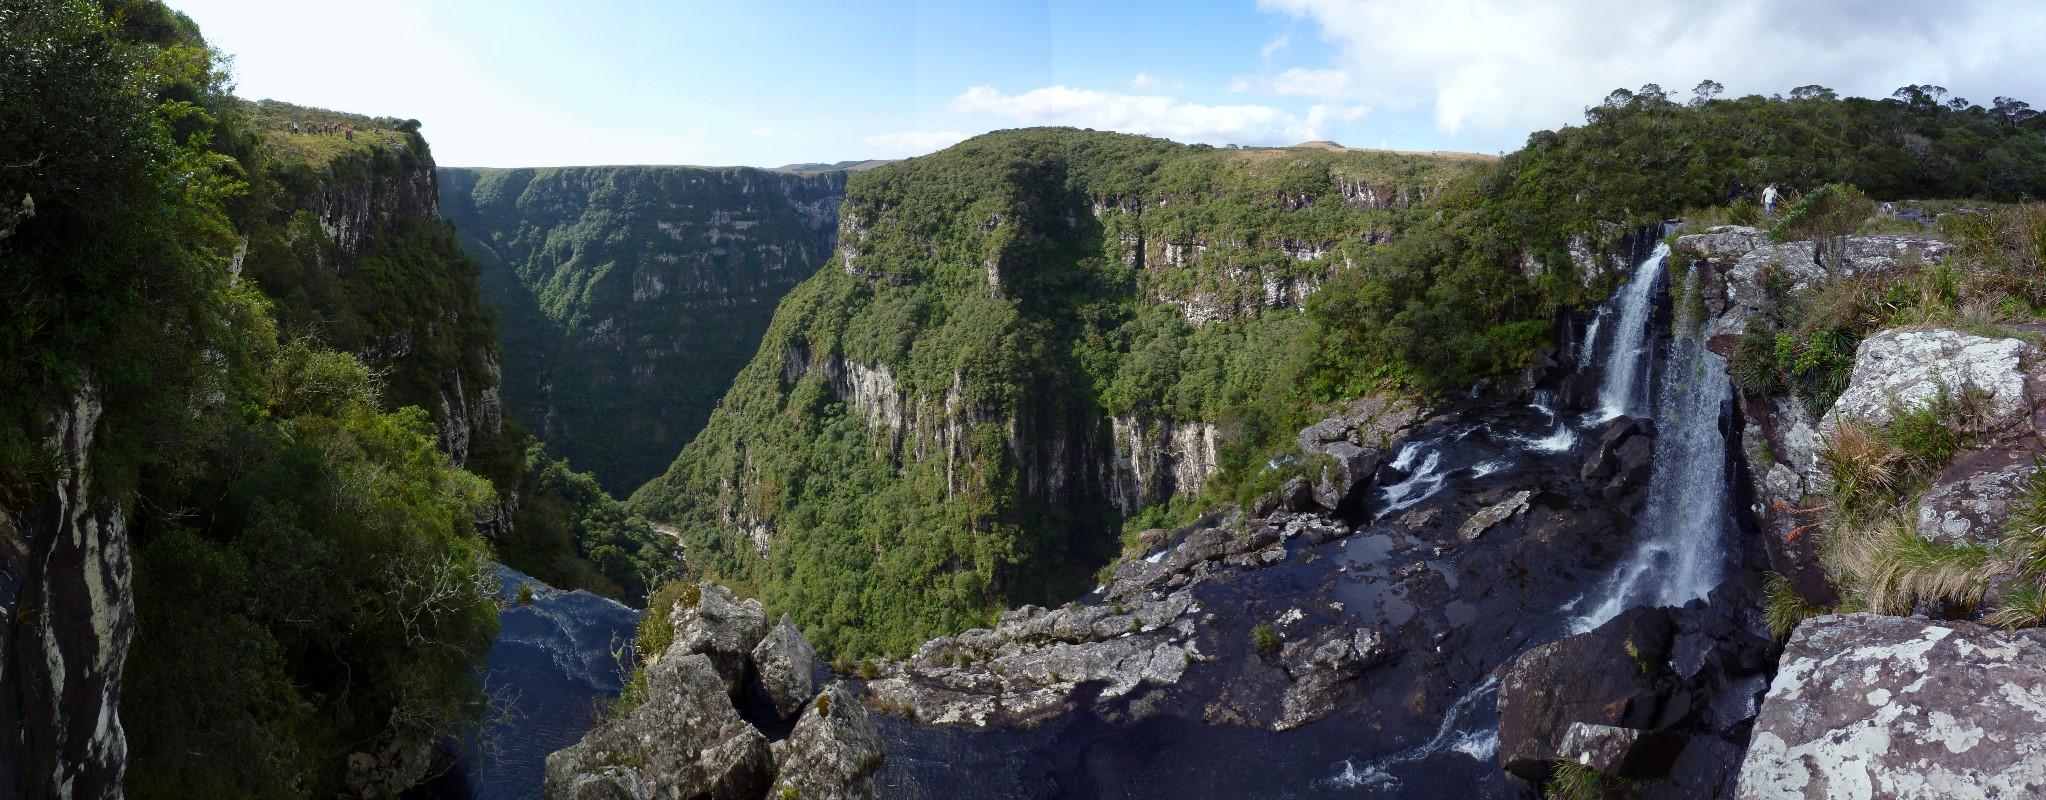 Wasserfall auf dem Weg zum Pedra do Segredo